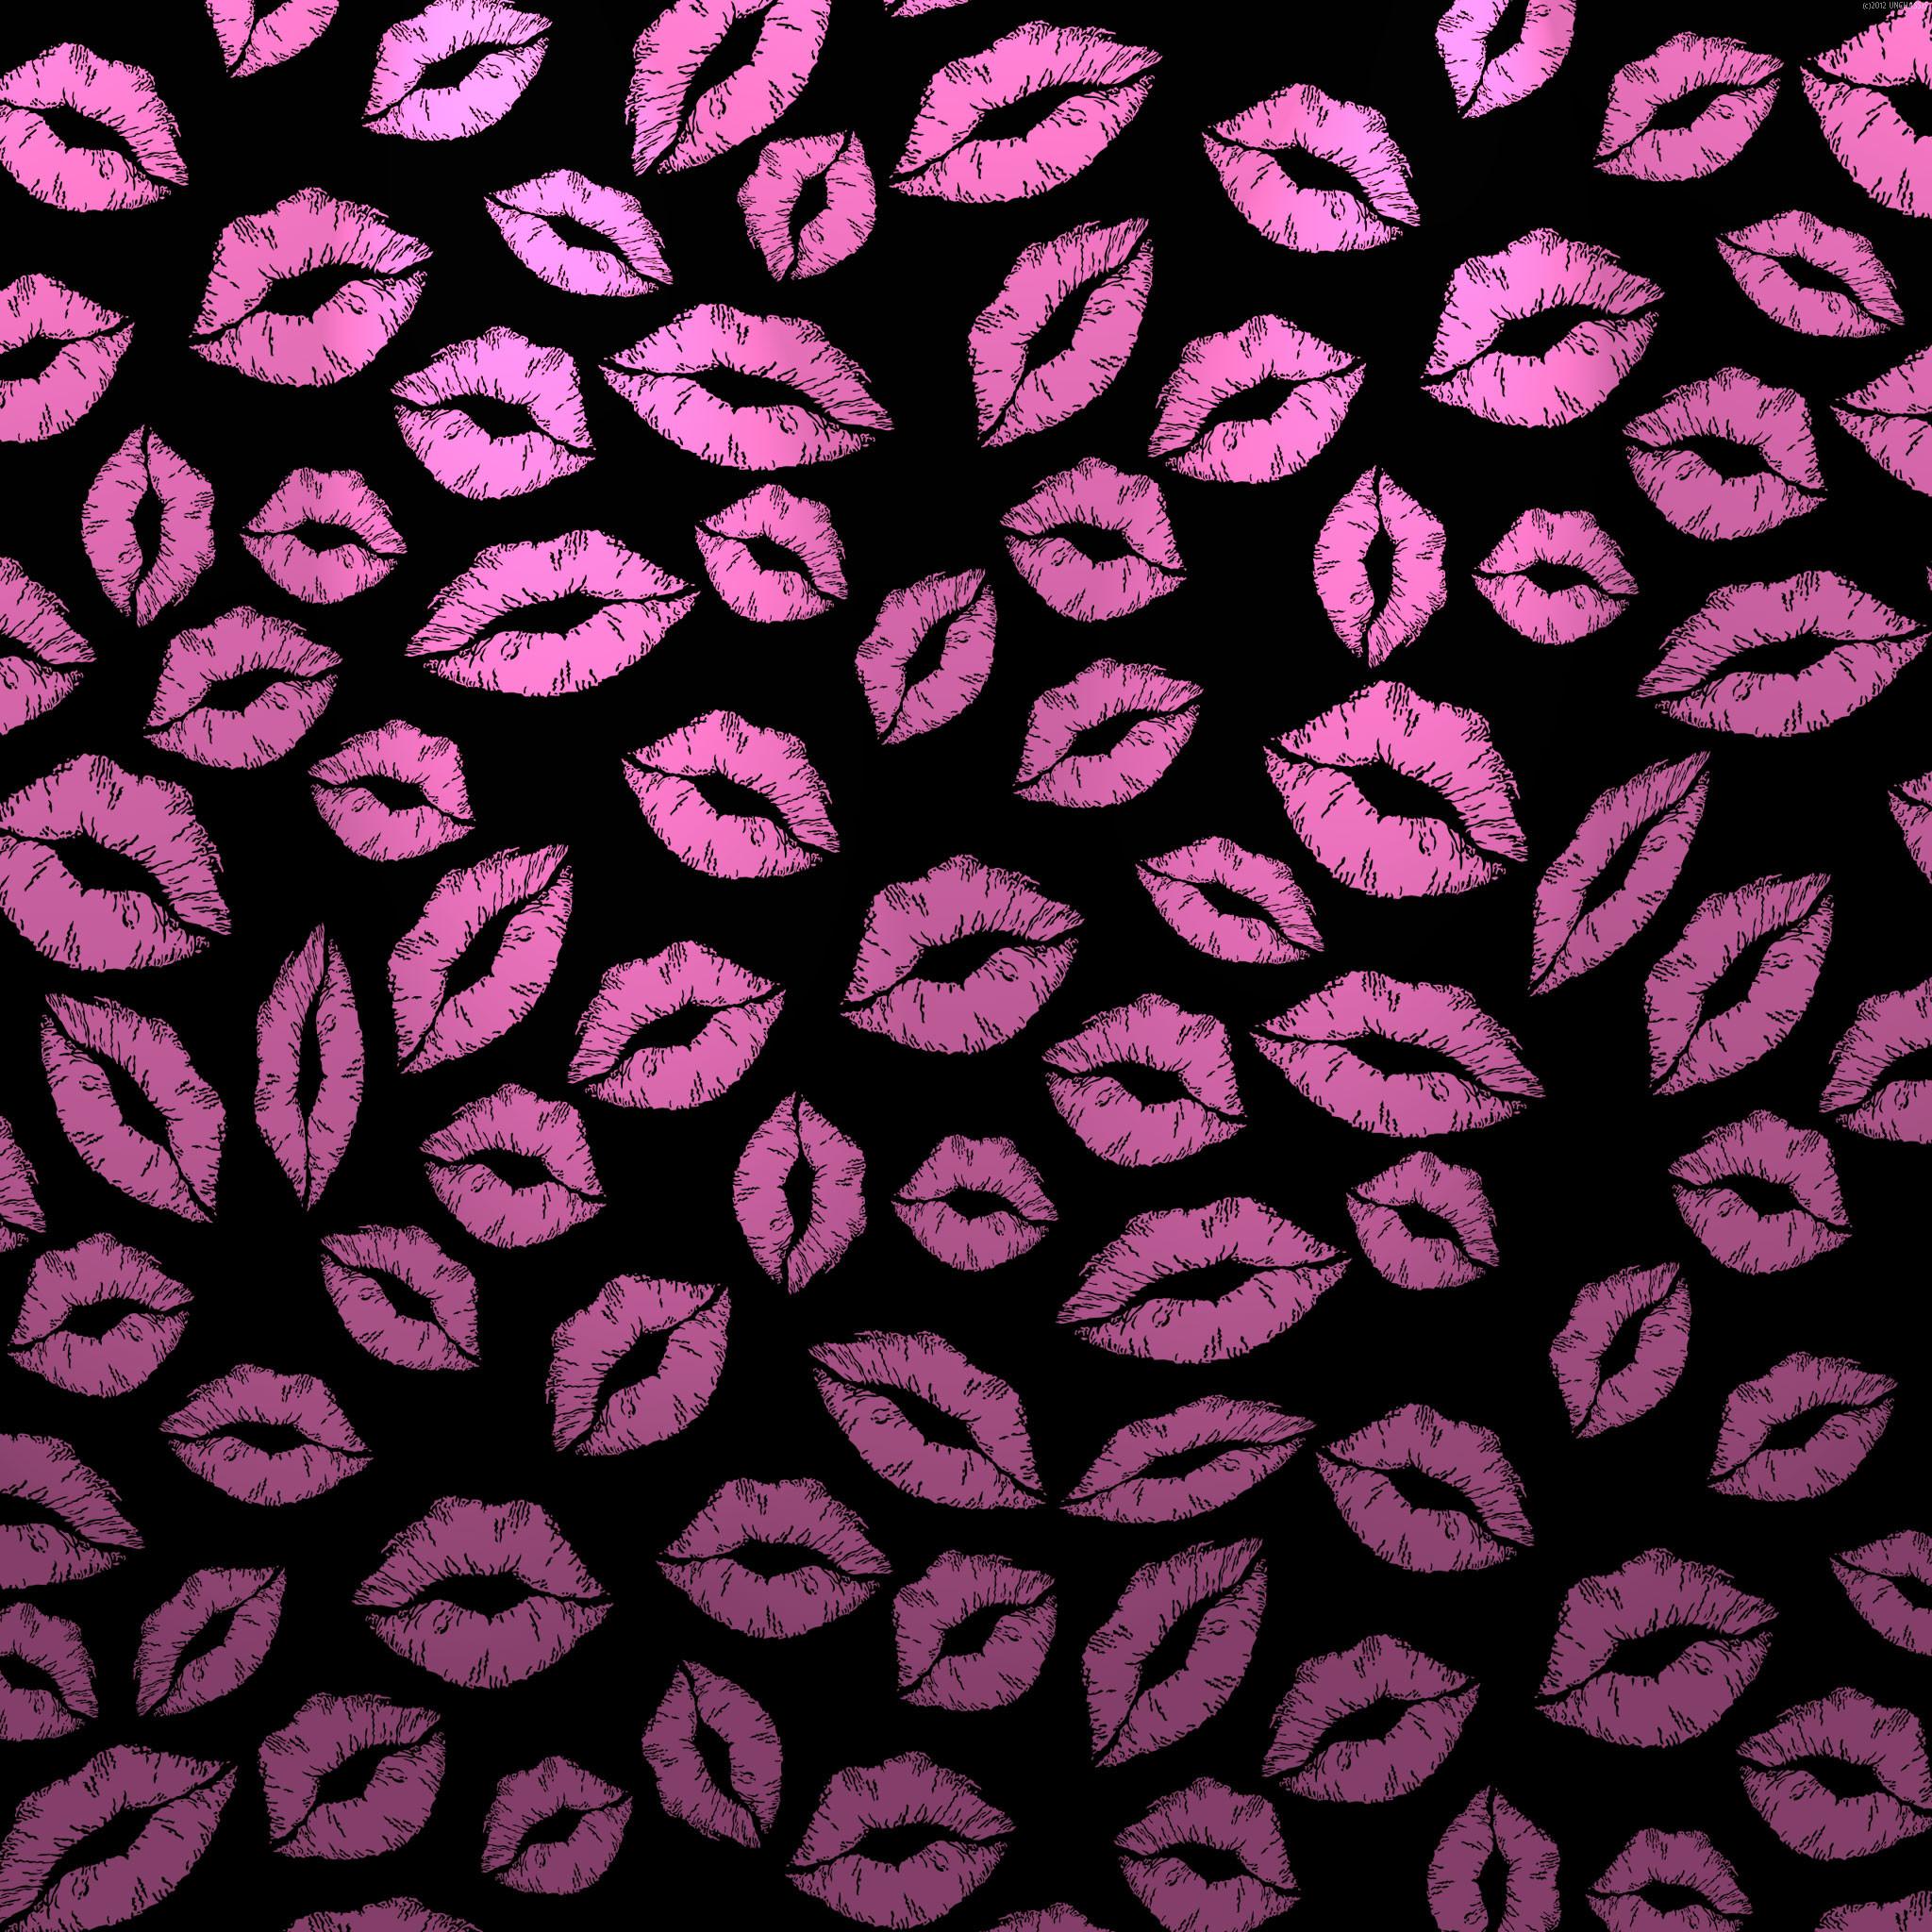 Wallpaper Black Pink: Black Pink And White Wallpaper (76+ Images